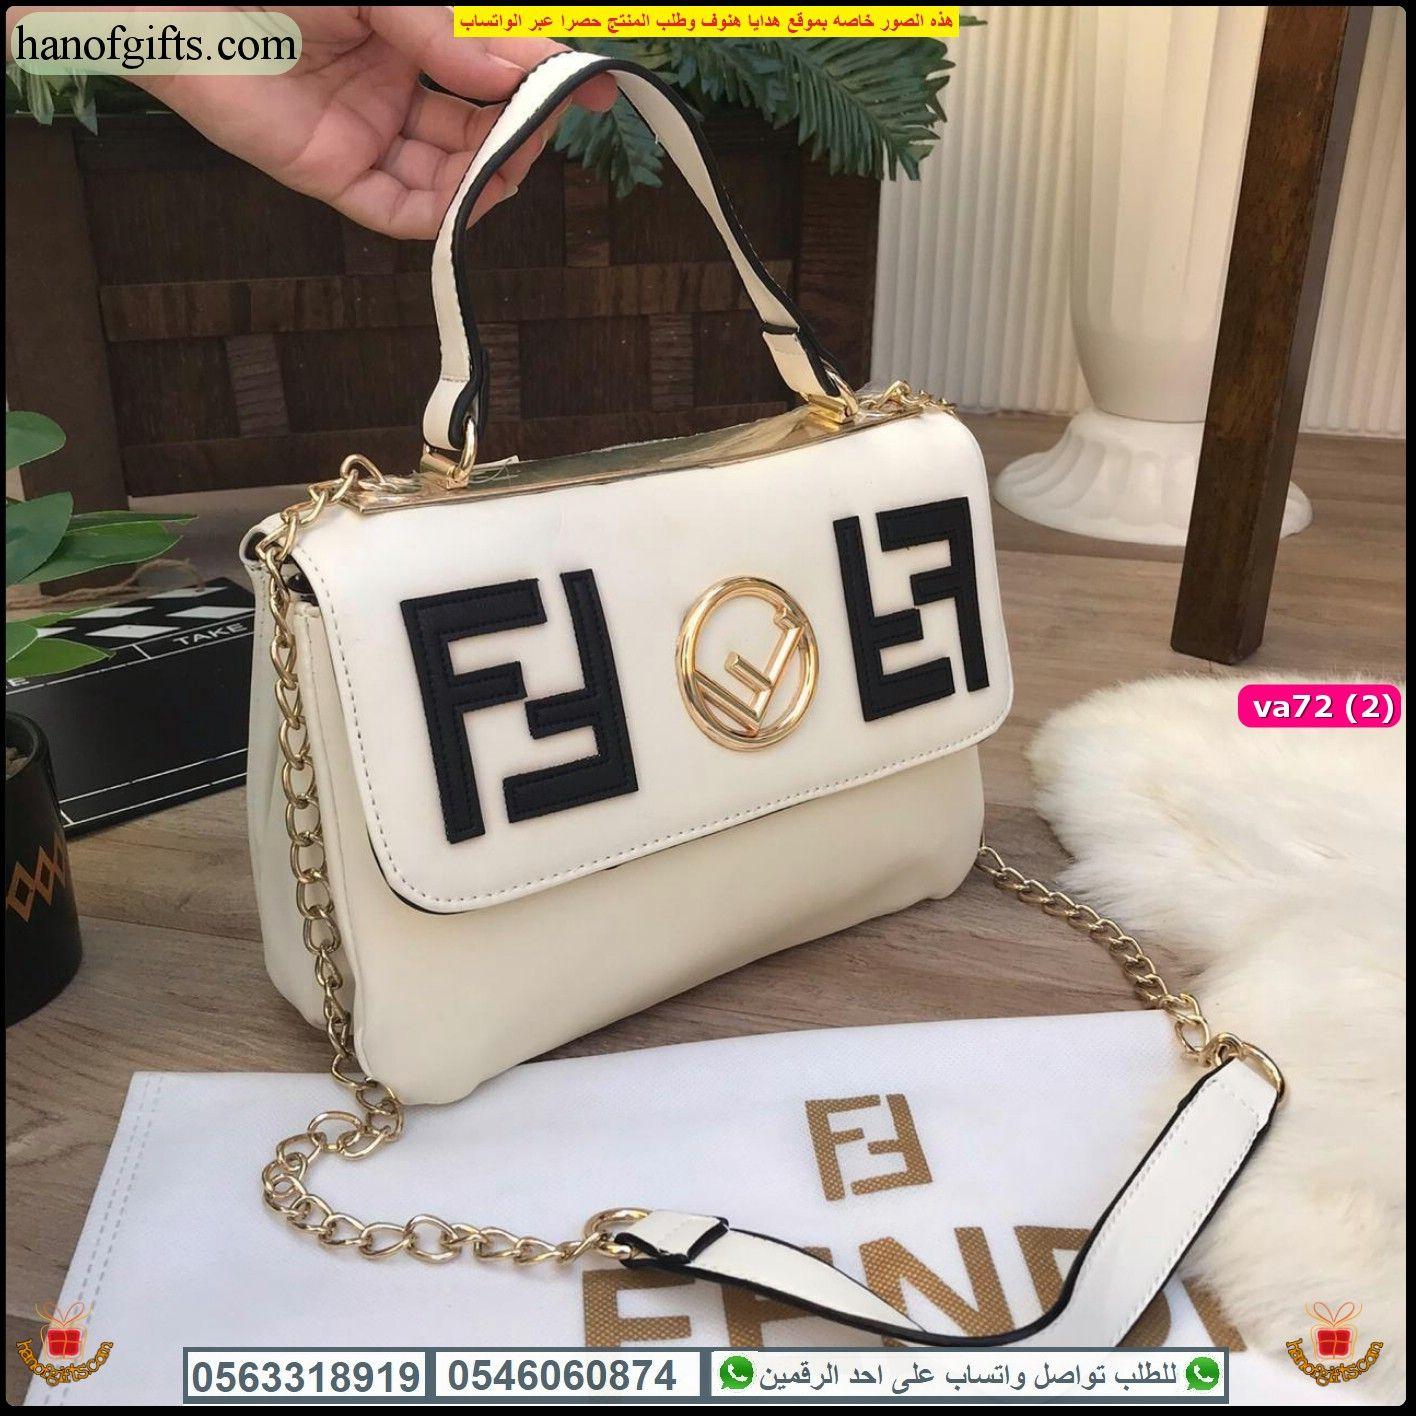 شنط فندي نسائي بجوده ممتازه الحجم وسط راقي ومميز مع كرت فندي هدايا هنوف Louis Vuitton Twist Bag Shoulder Bag Louis Vuitton Twist